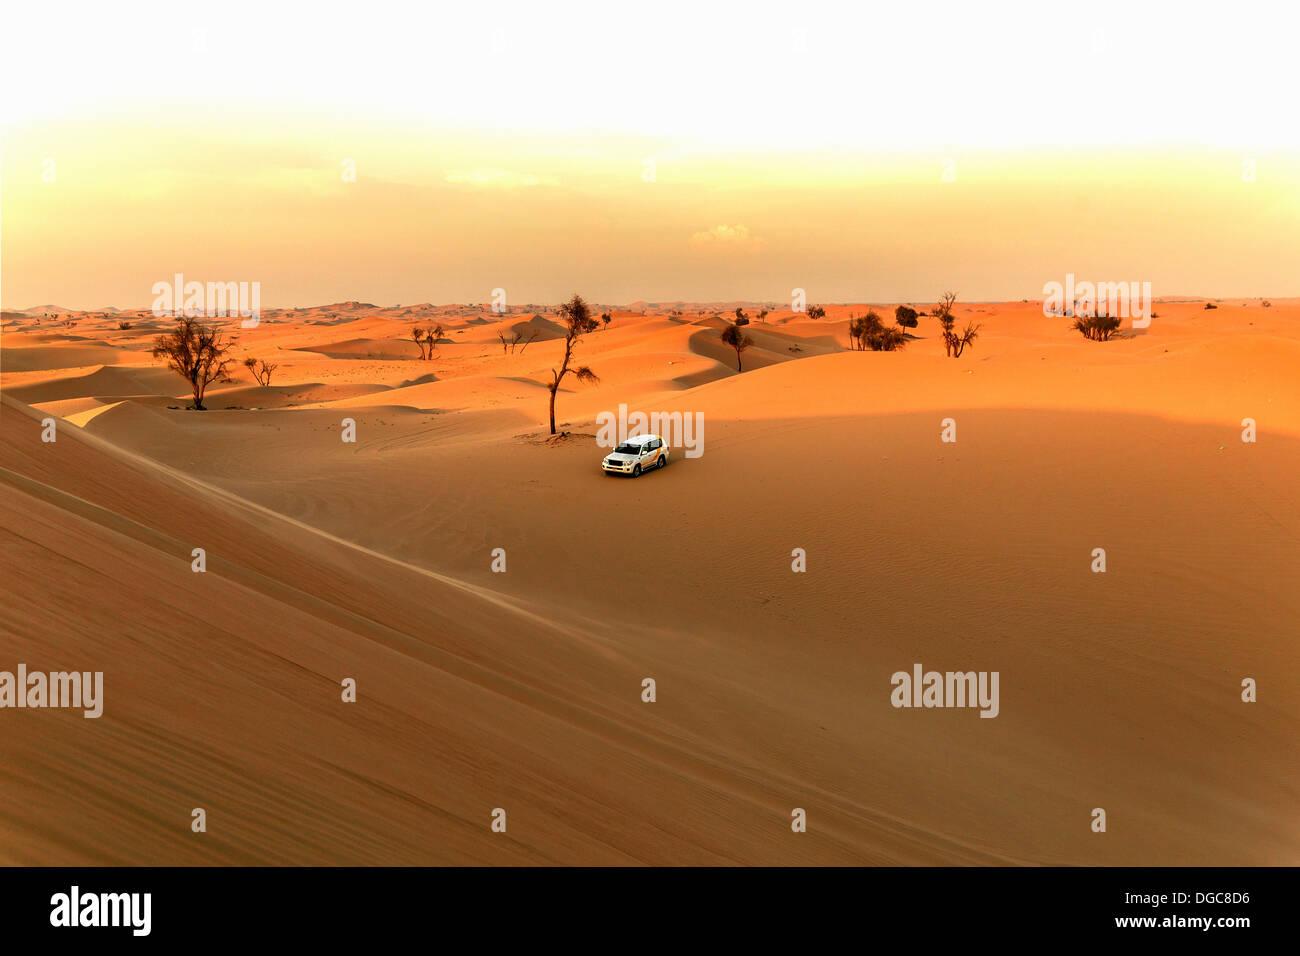 Off road vehicle in desert, Adu Dhabi, United Arab Emirates - Stock Image